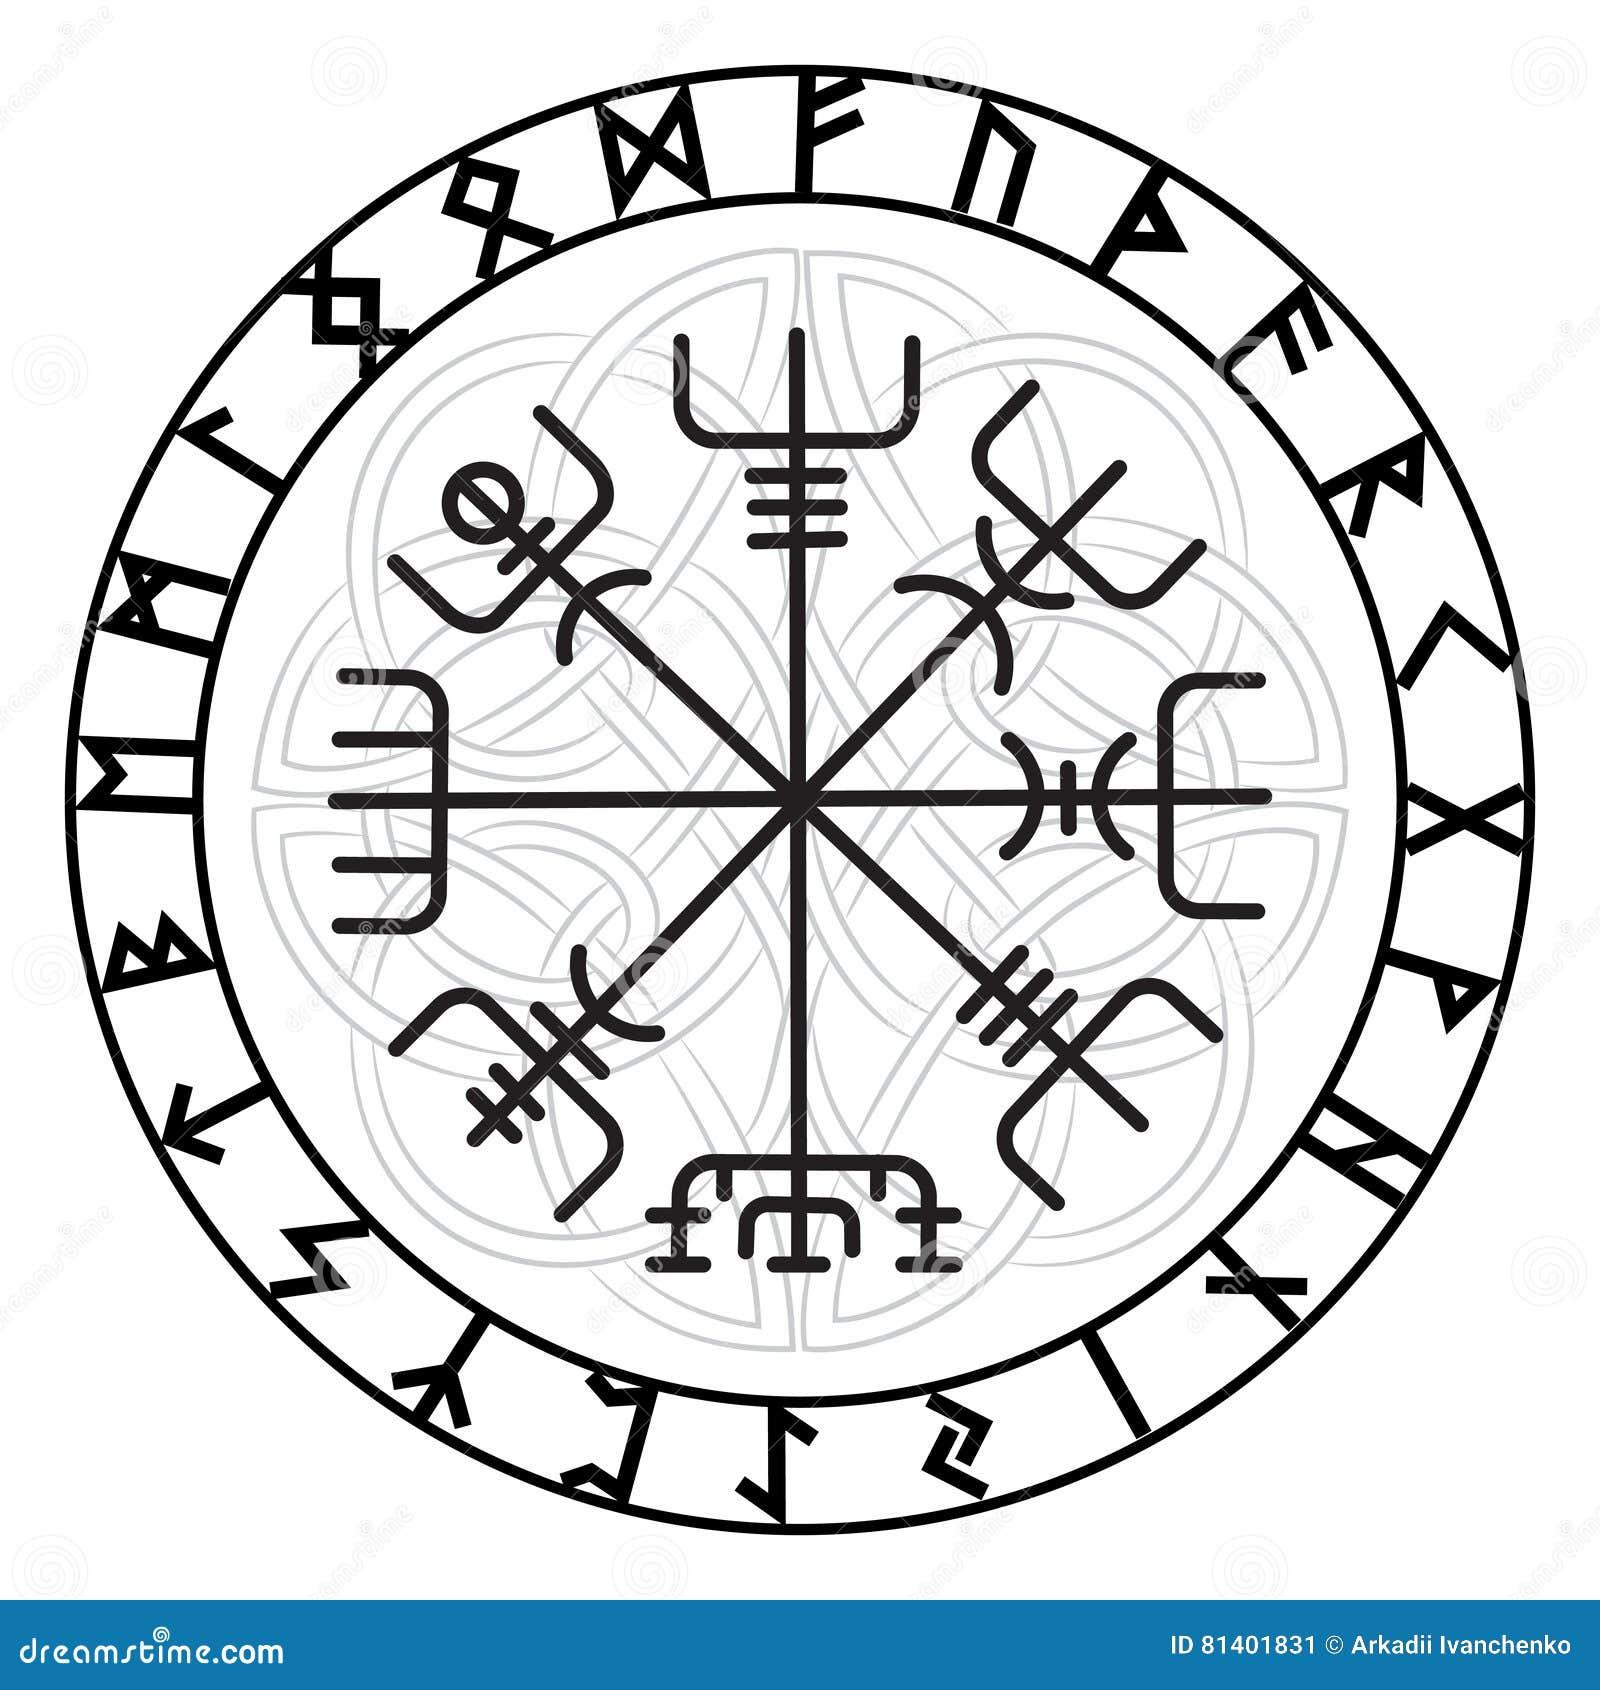 Image Result For Scandinavian Vikings Symbol